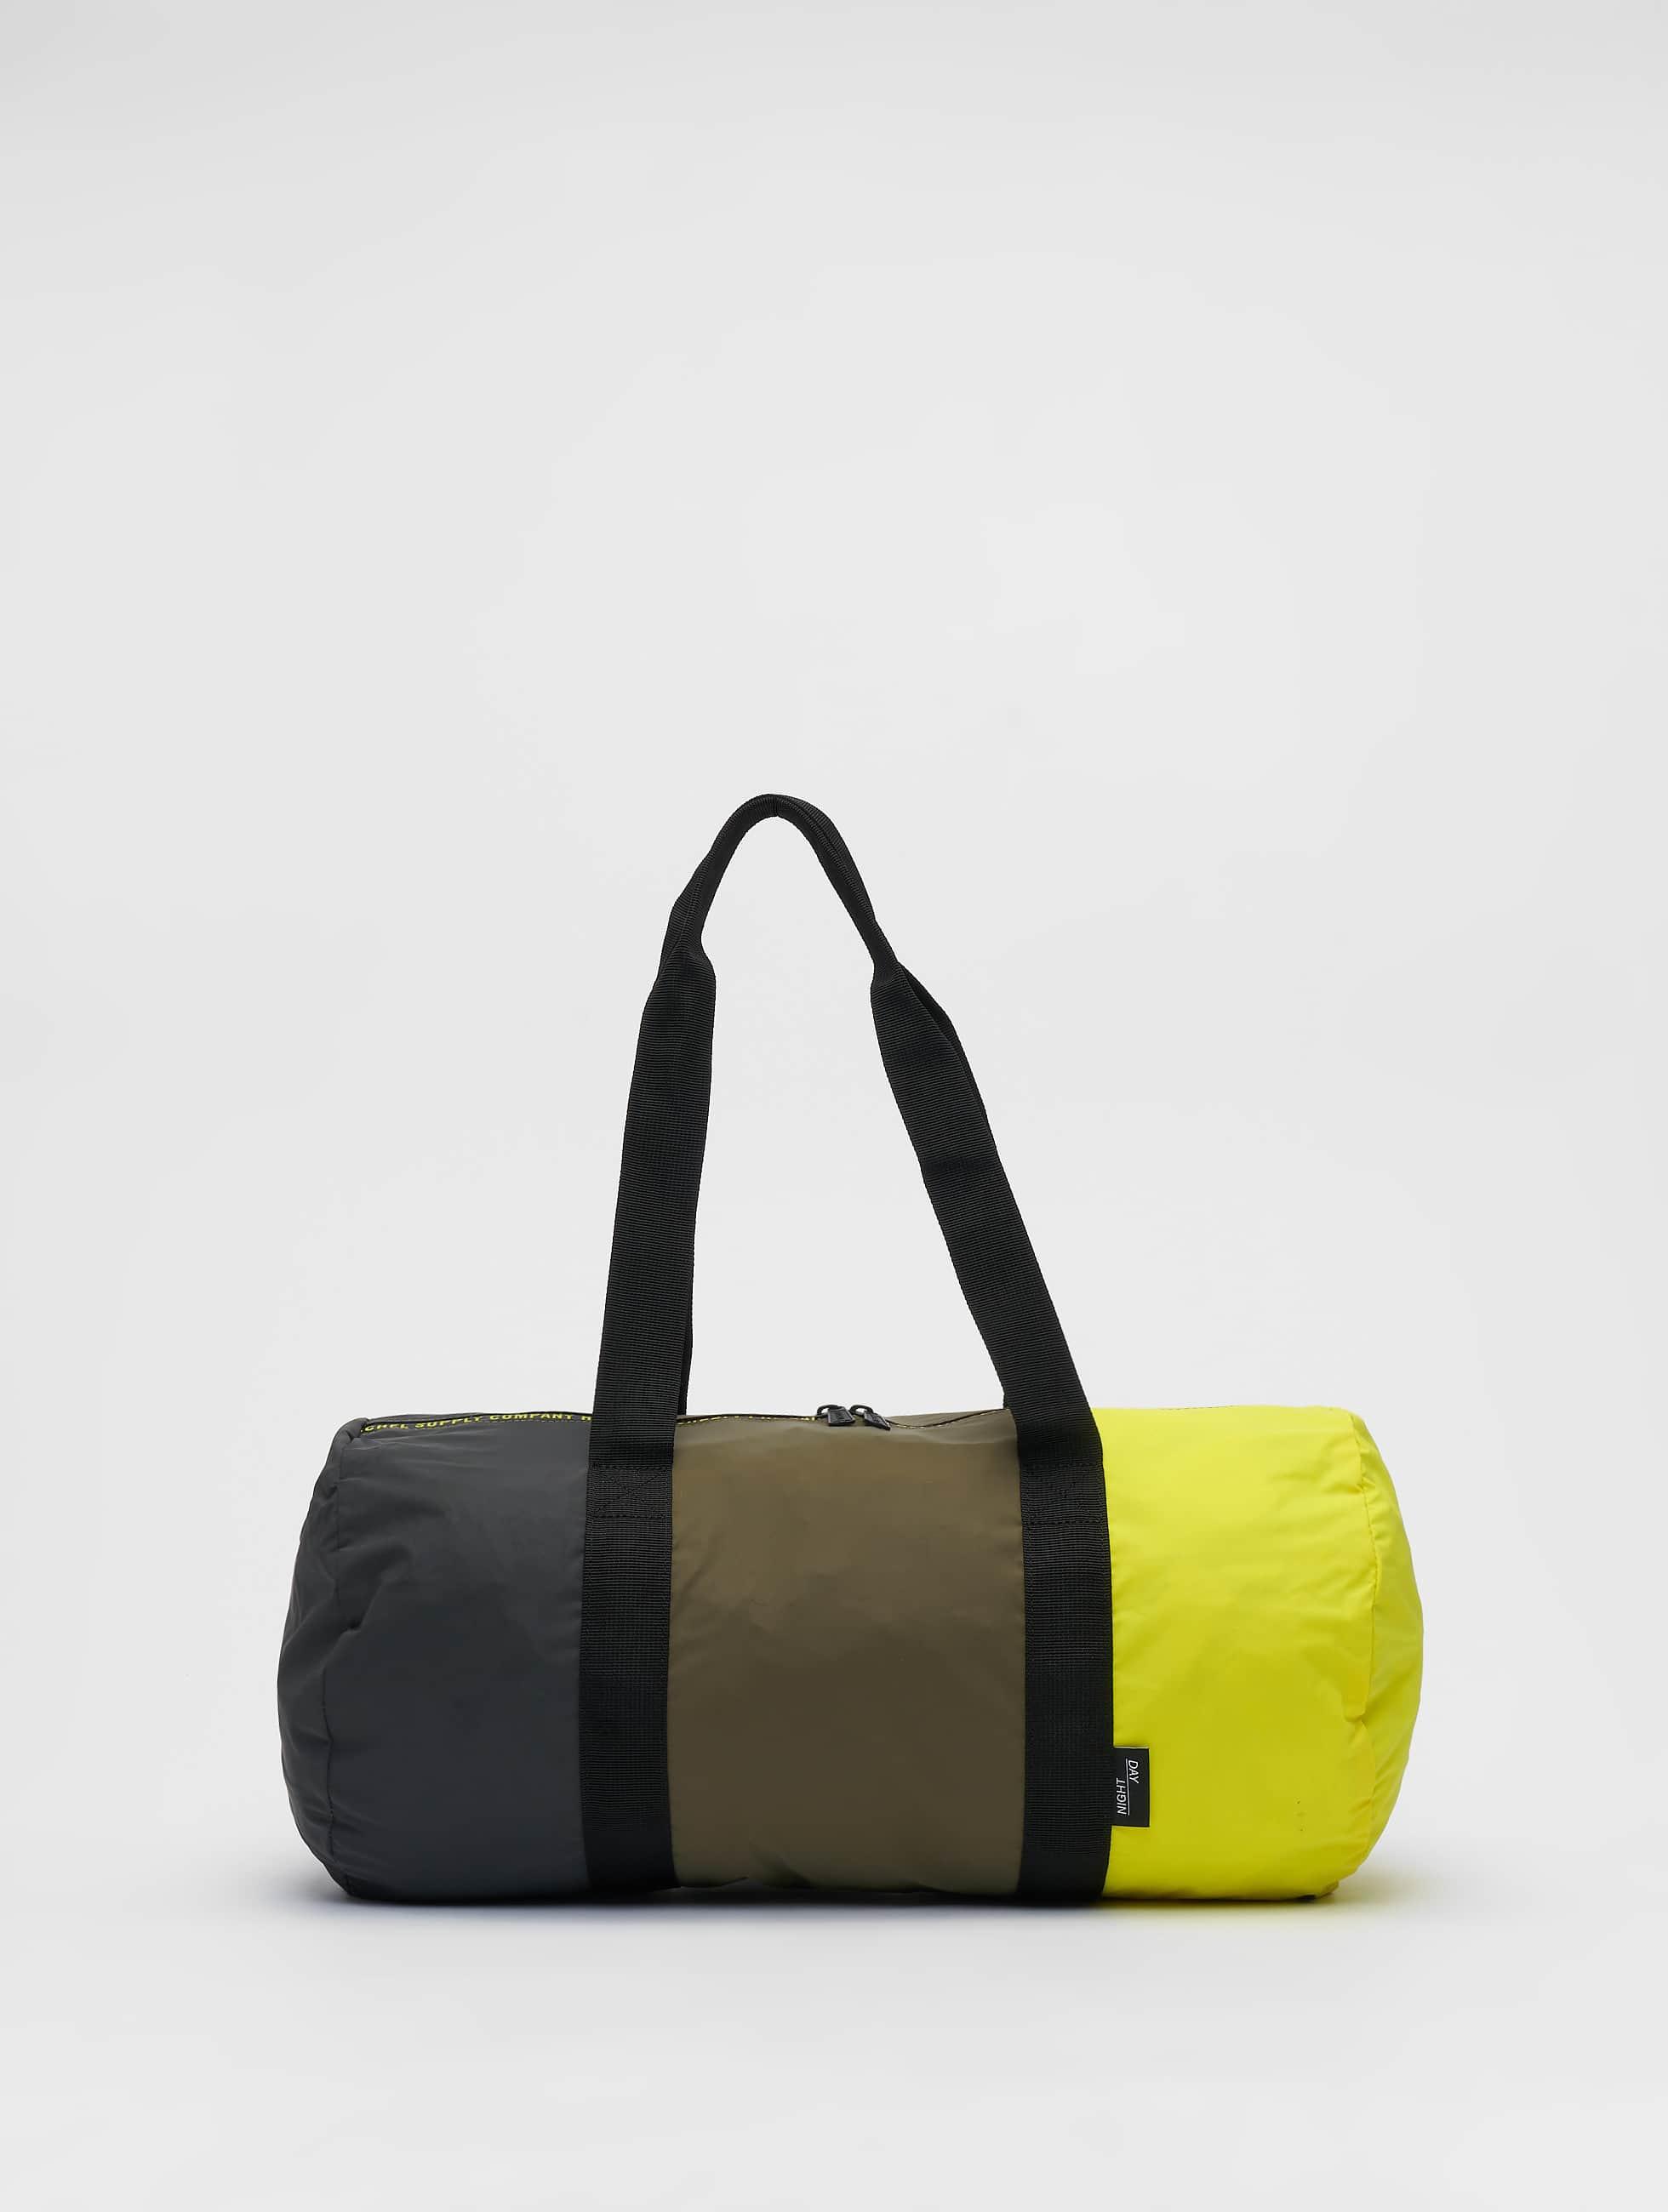 Herschel Packable Duffle Bag Sulfur SpringOlive NightBlack Reflective